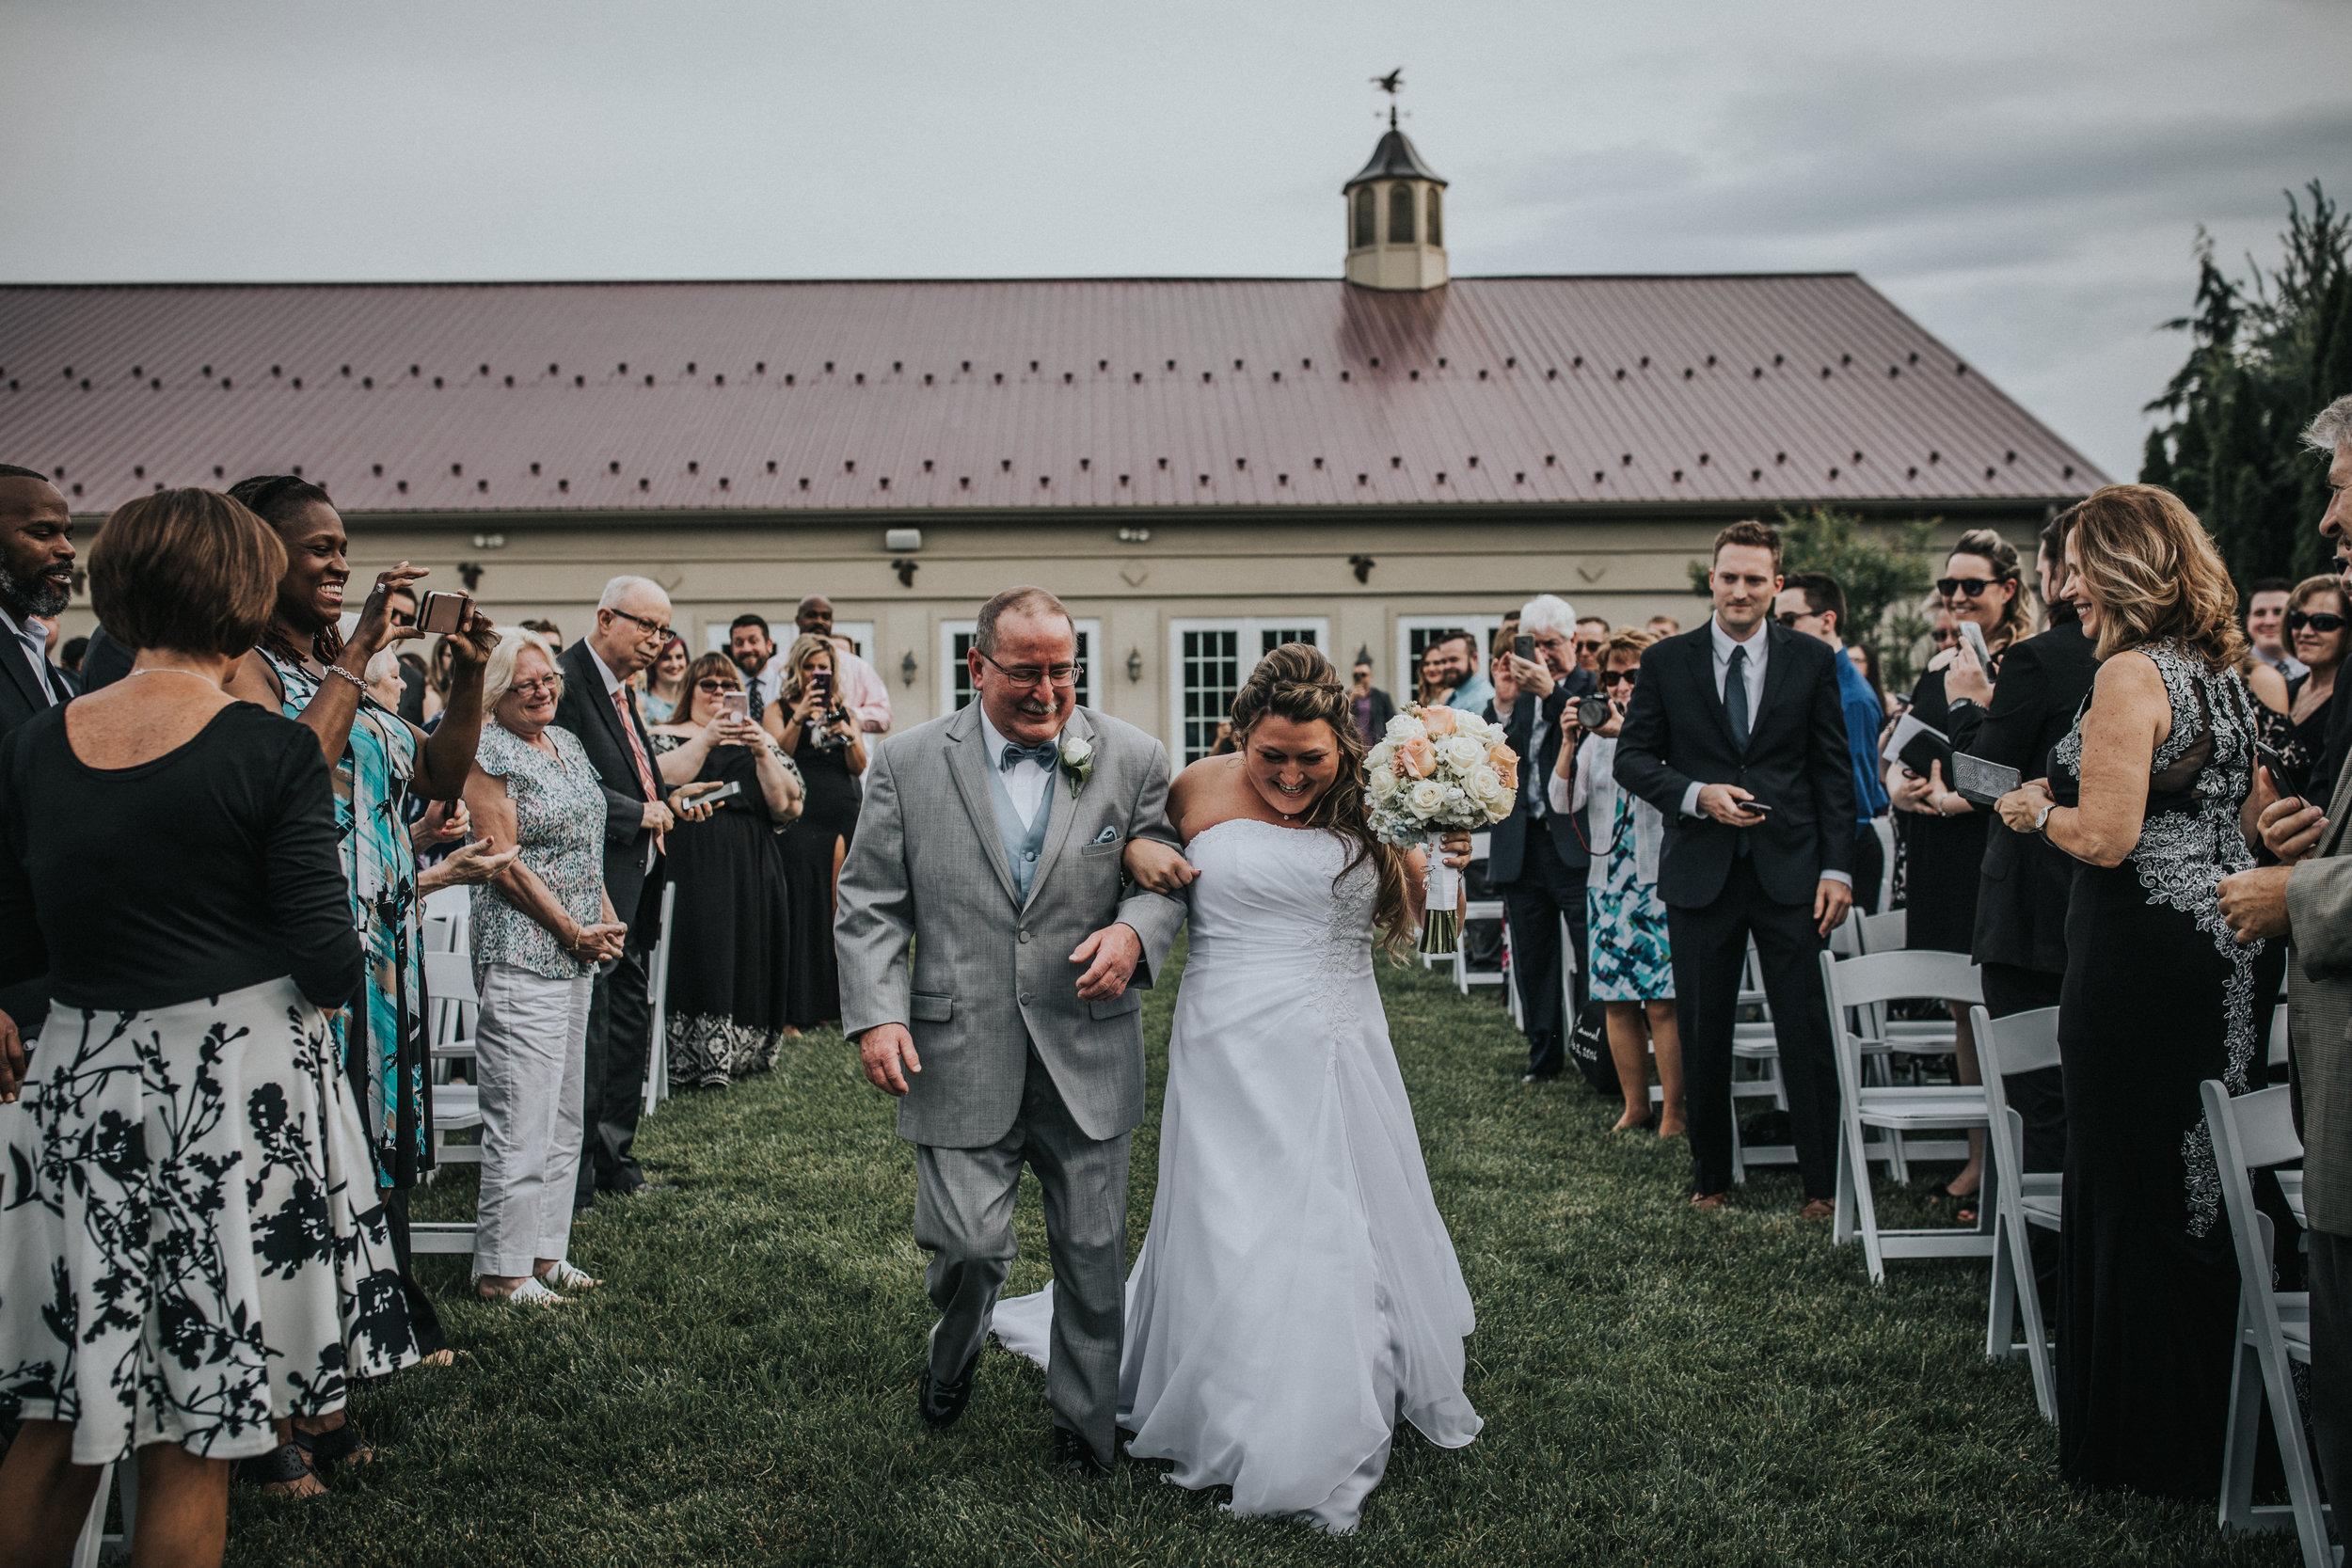 New-Jersey-Wedding-Photographer-JennaLynnPhotography-ValenzanoWinery-Ceremony-36.jpg